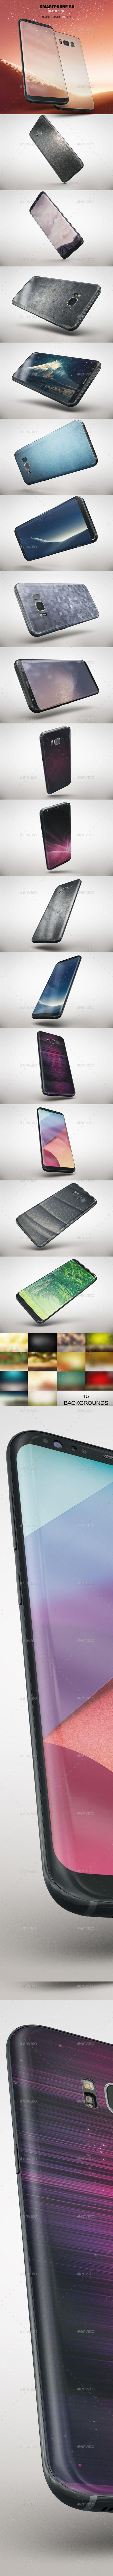 SmartPhone Galaxy S8 App & Skin MockUp — Photoshop PSD #galaxy s8 2017 #s8 mockup • Download ➝ https://graphicriver.net/item/smartphone-galaxy-s8-app-skin-mockup/19855298?ref=pxcr